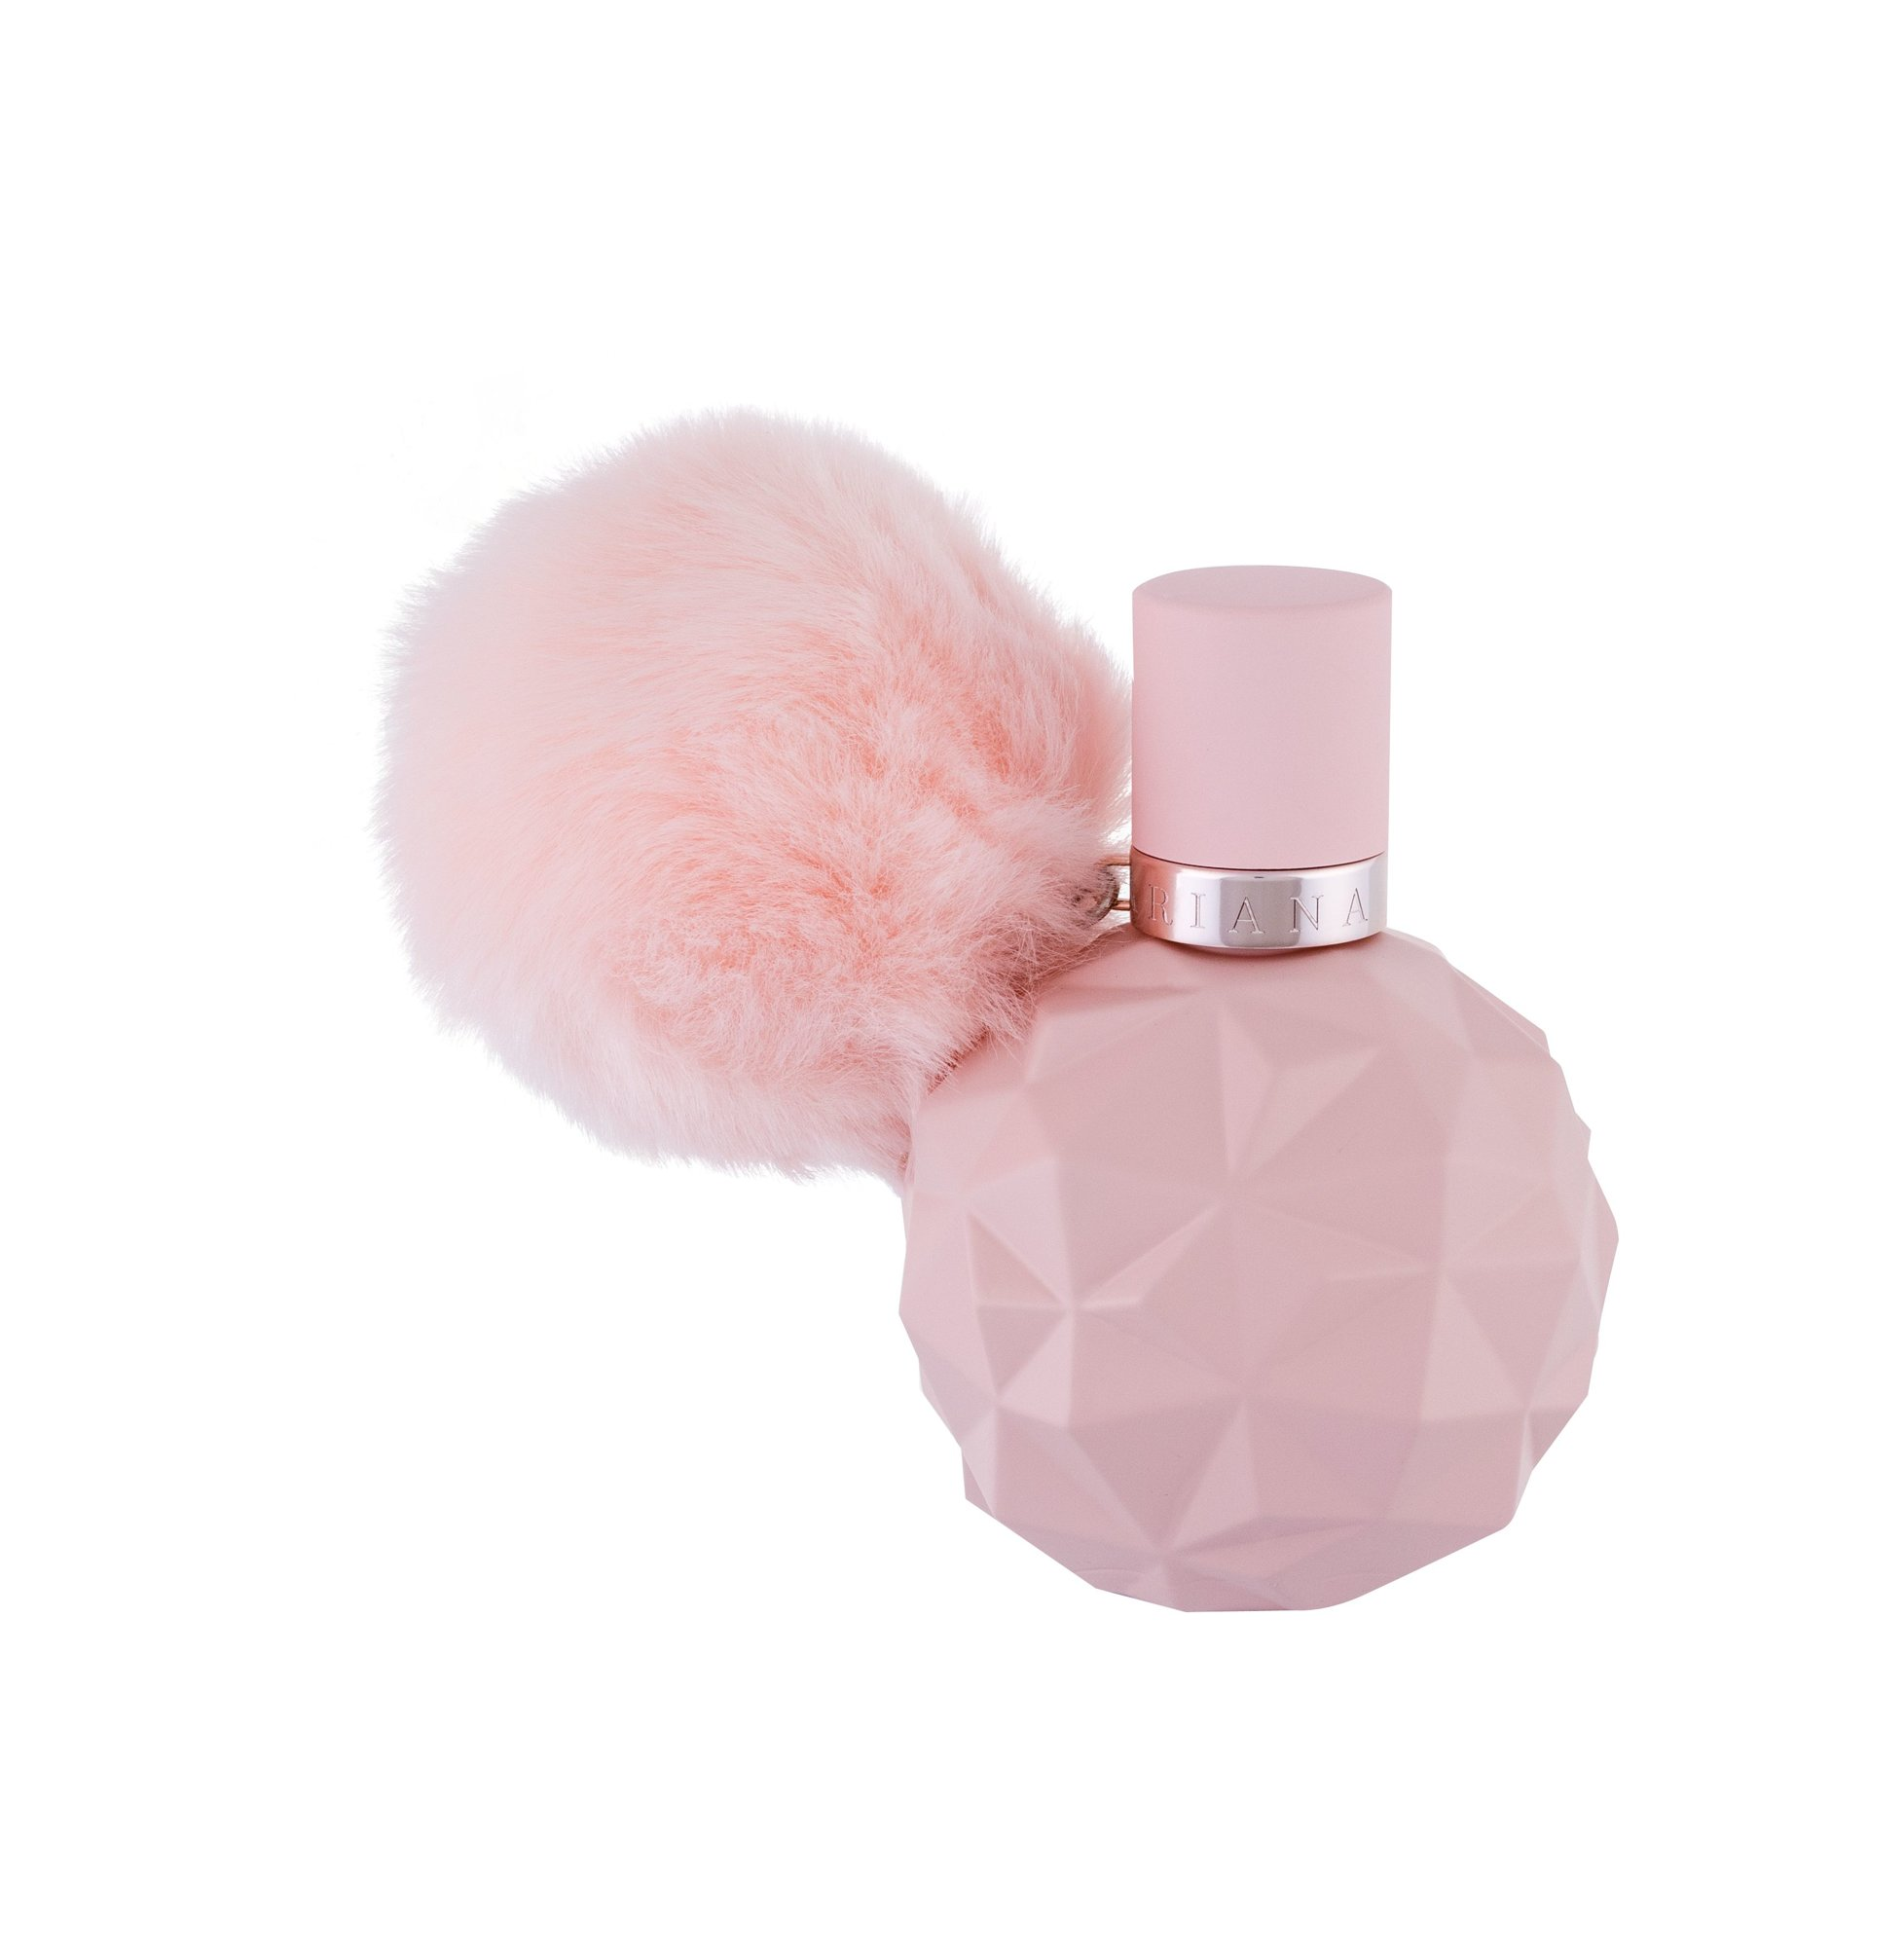 Ariana Grande Sweet Like Candy Eau de Parfum 30ml